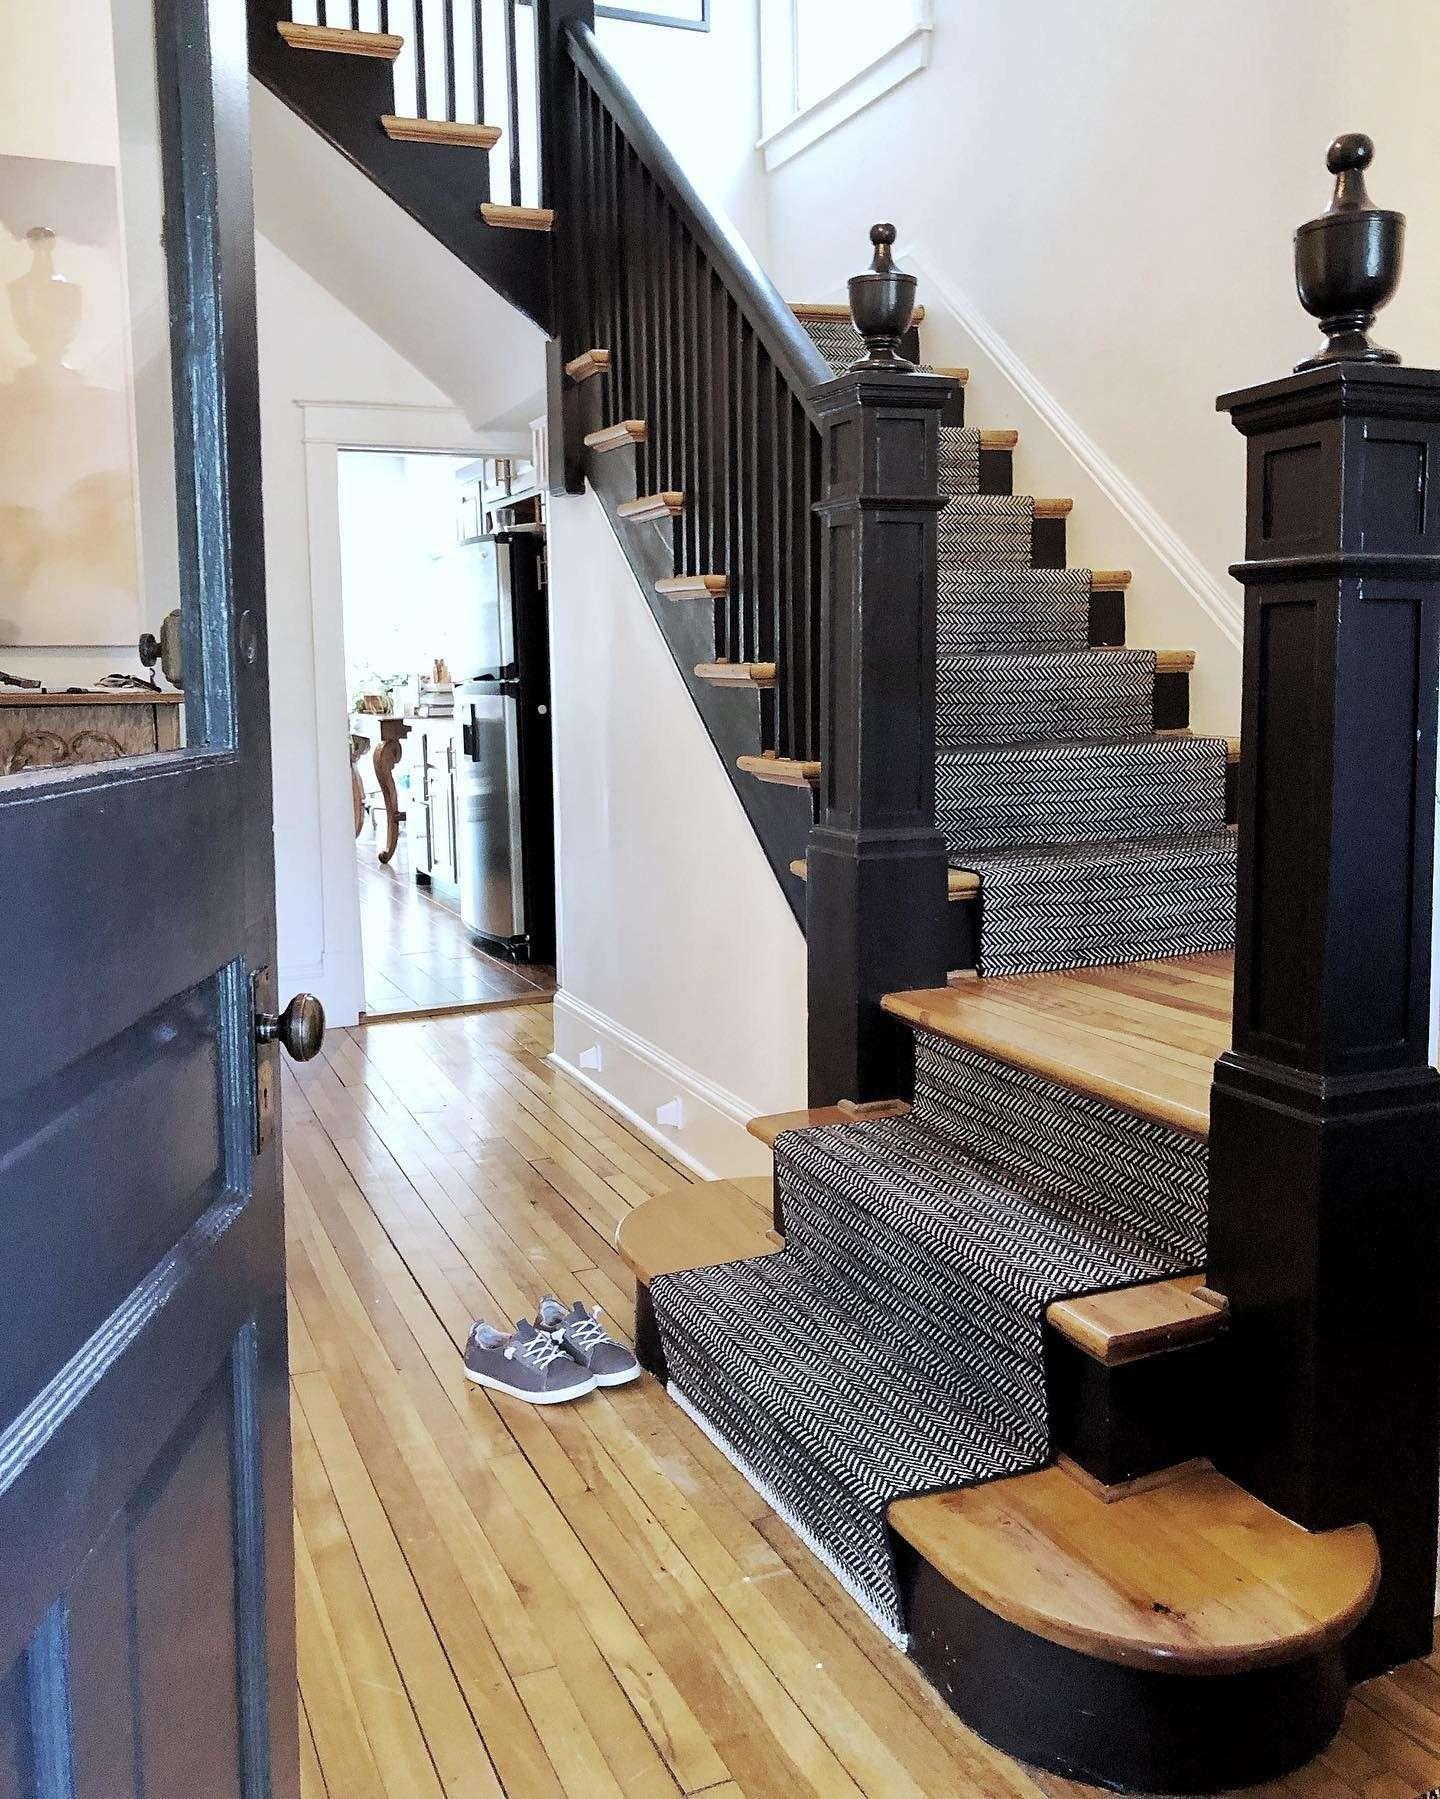 How To Choose A Stair Runner Rug Annie Selke | Indoor Outdoor Stair Runner | Antelope | Contemporary | Dash | Classic | Herringbone